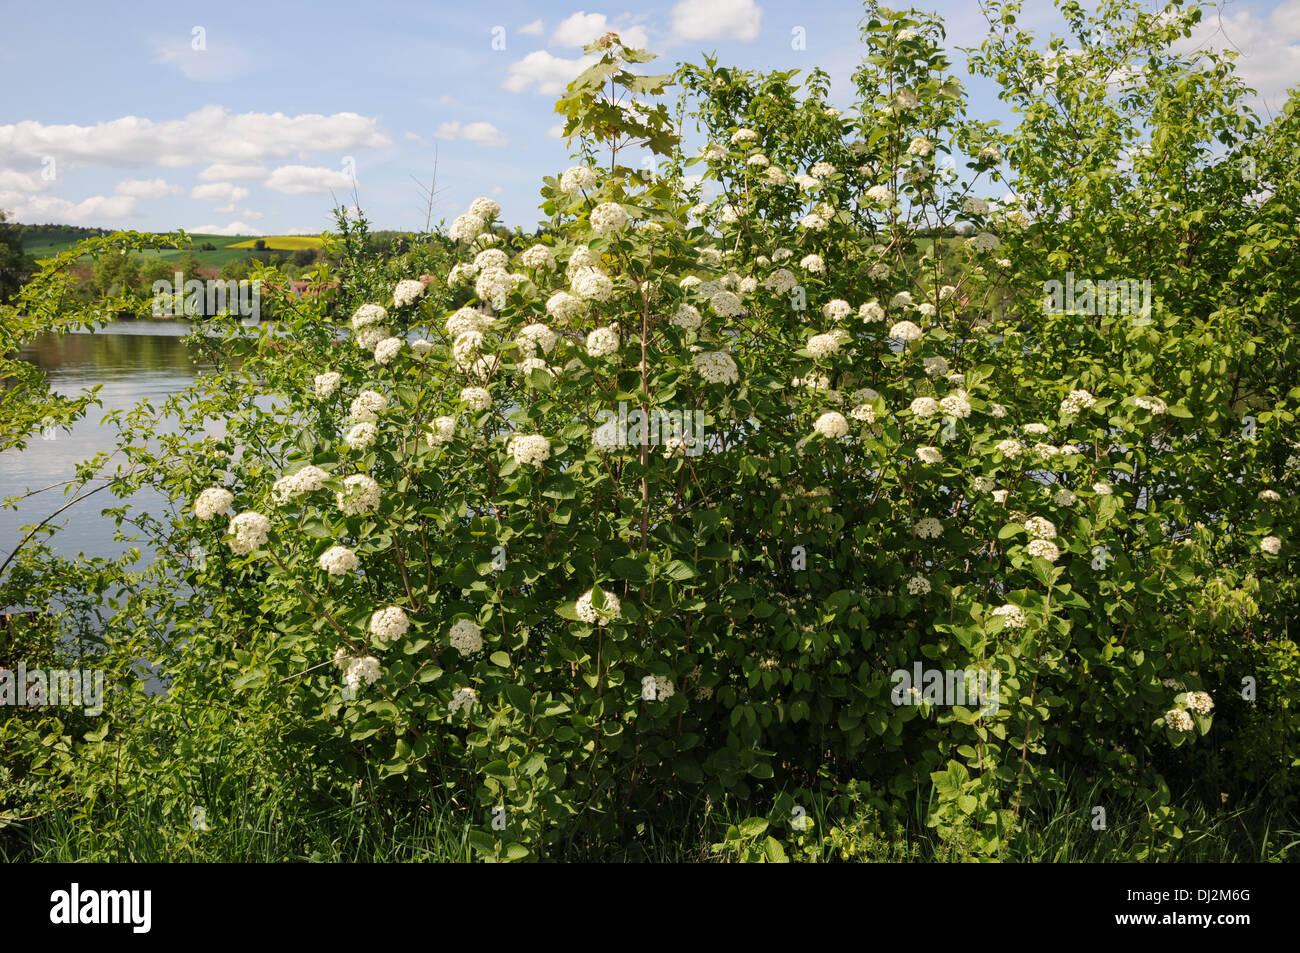 Viburnum lantana - Stock Image